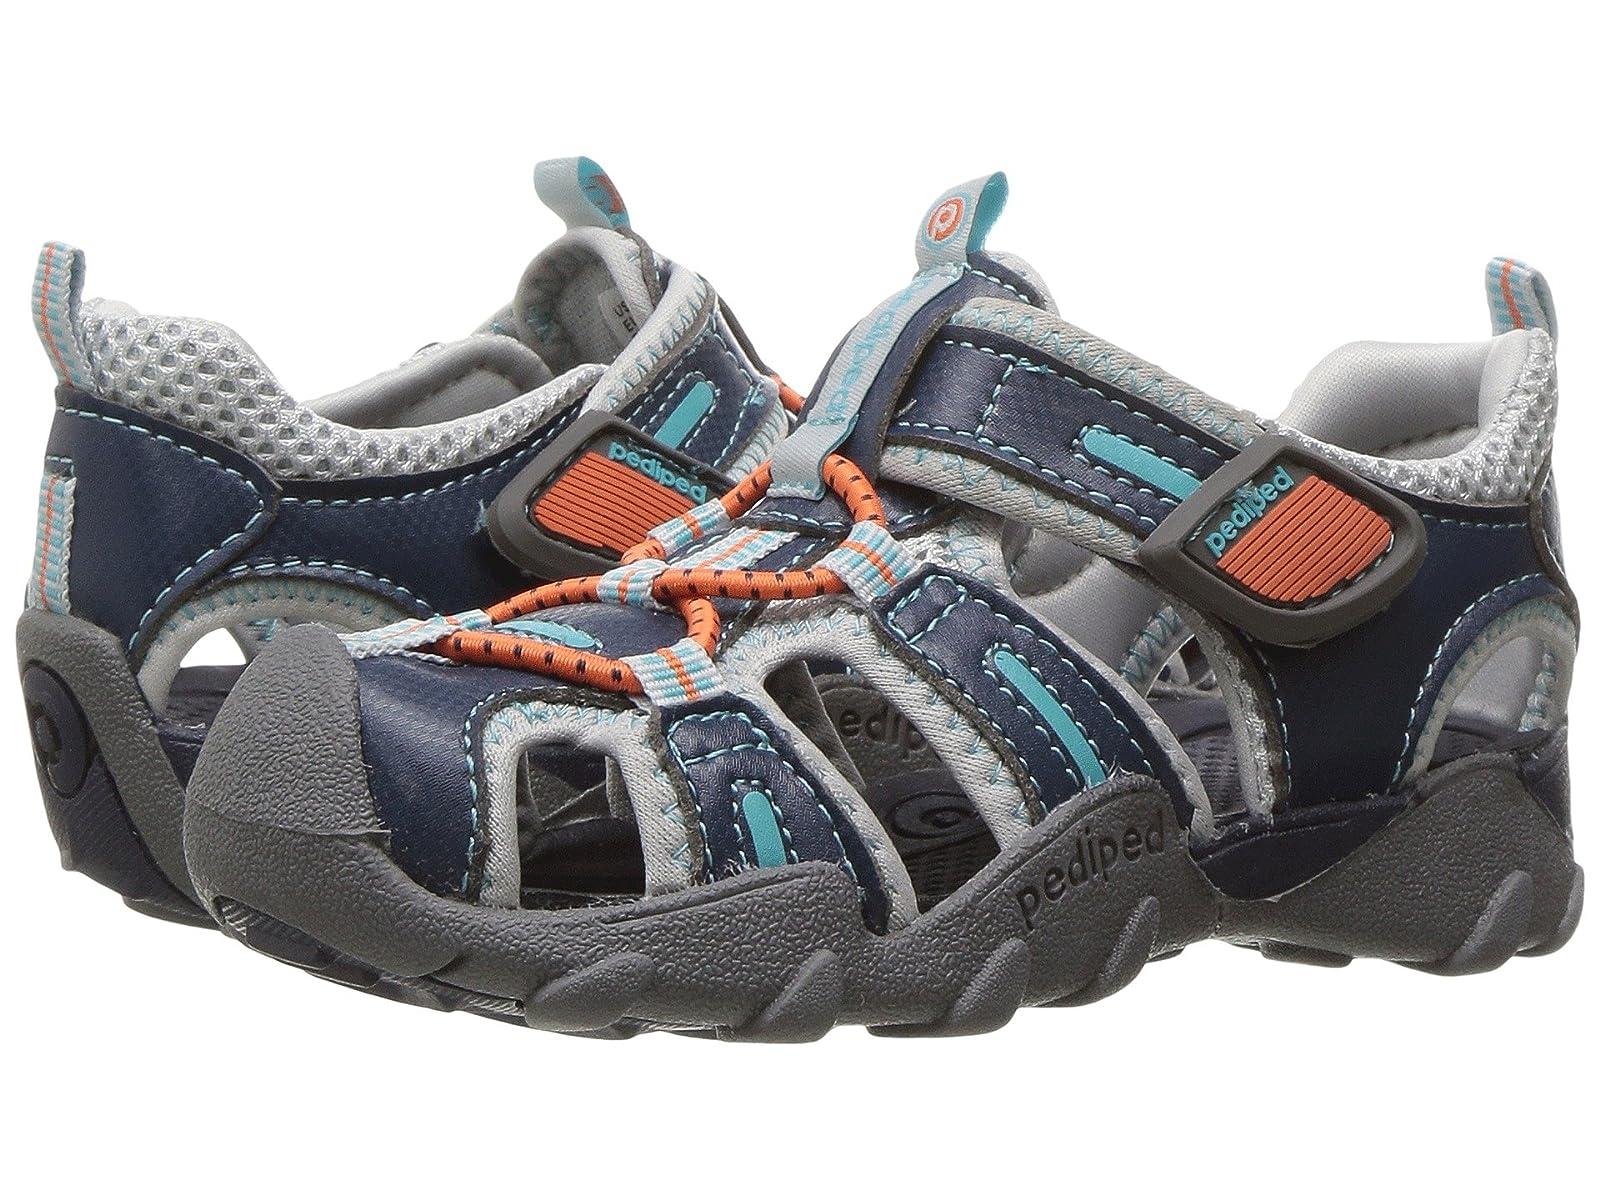 pediped Canyon Flex (Toddler/Little Kid/Big Kid)Atmospheric grades have affordable shoes